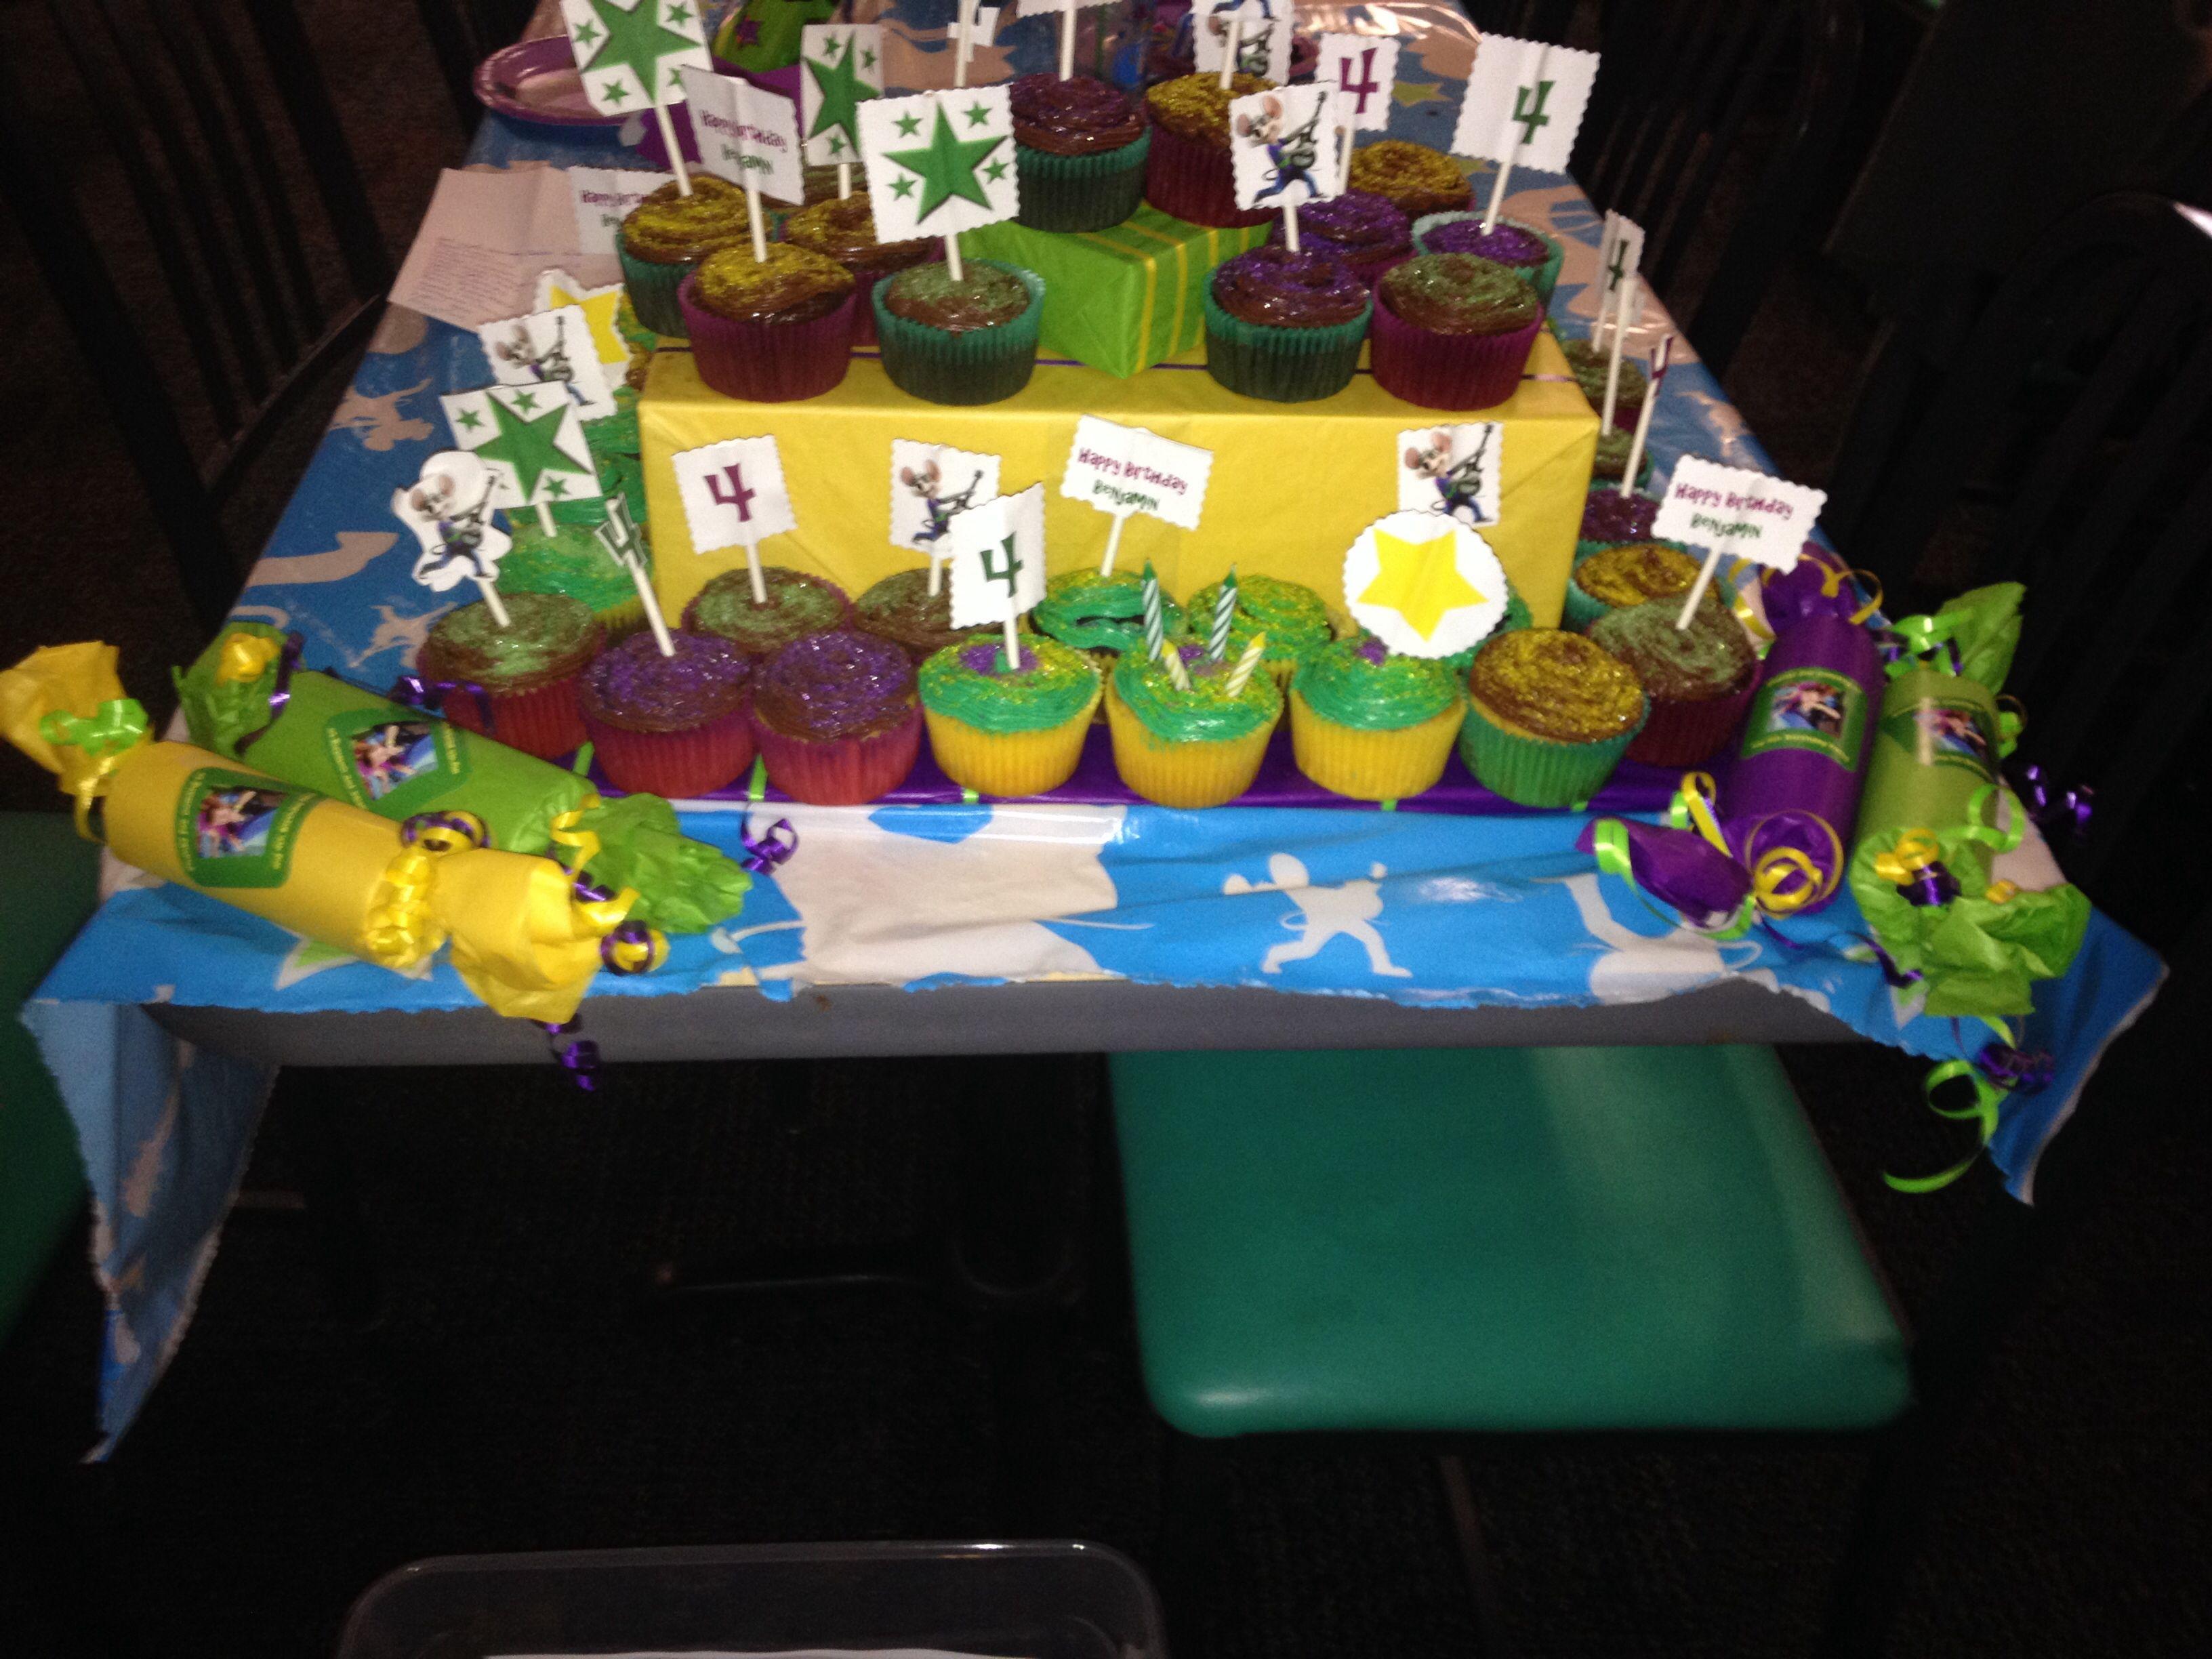 Chuck E Cheese DIY cupcakes cupcake toppers thank you goodies